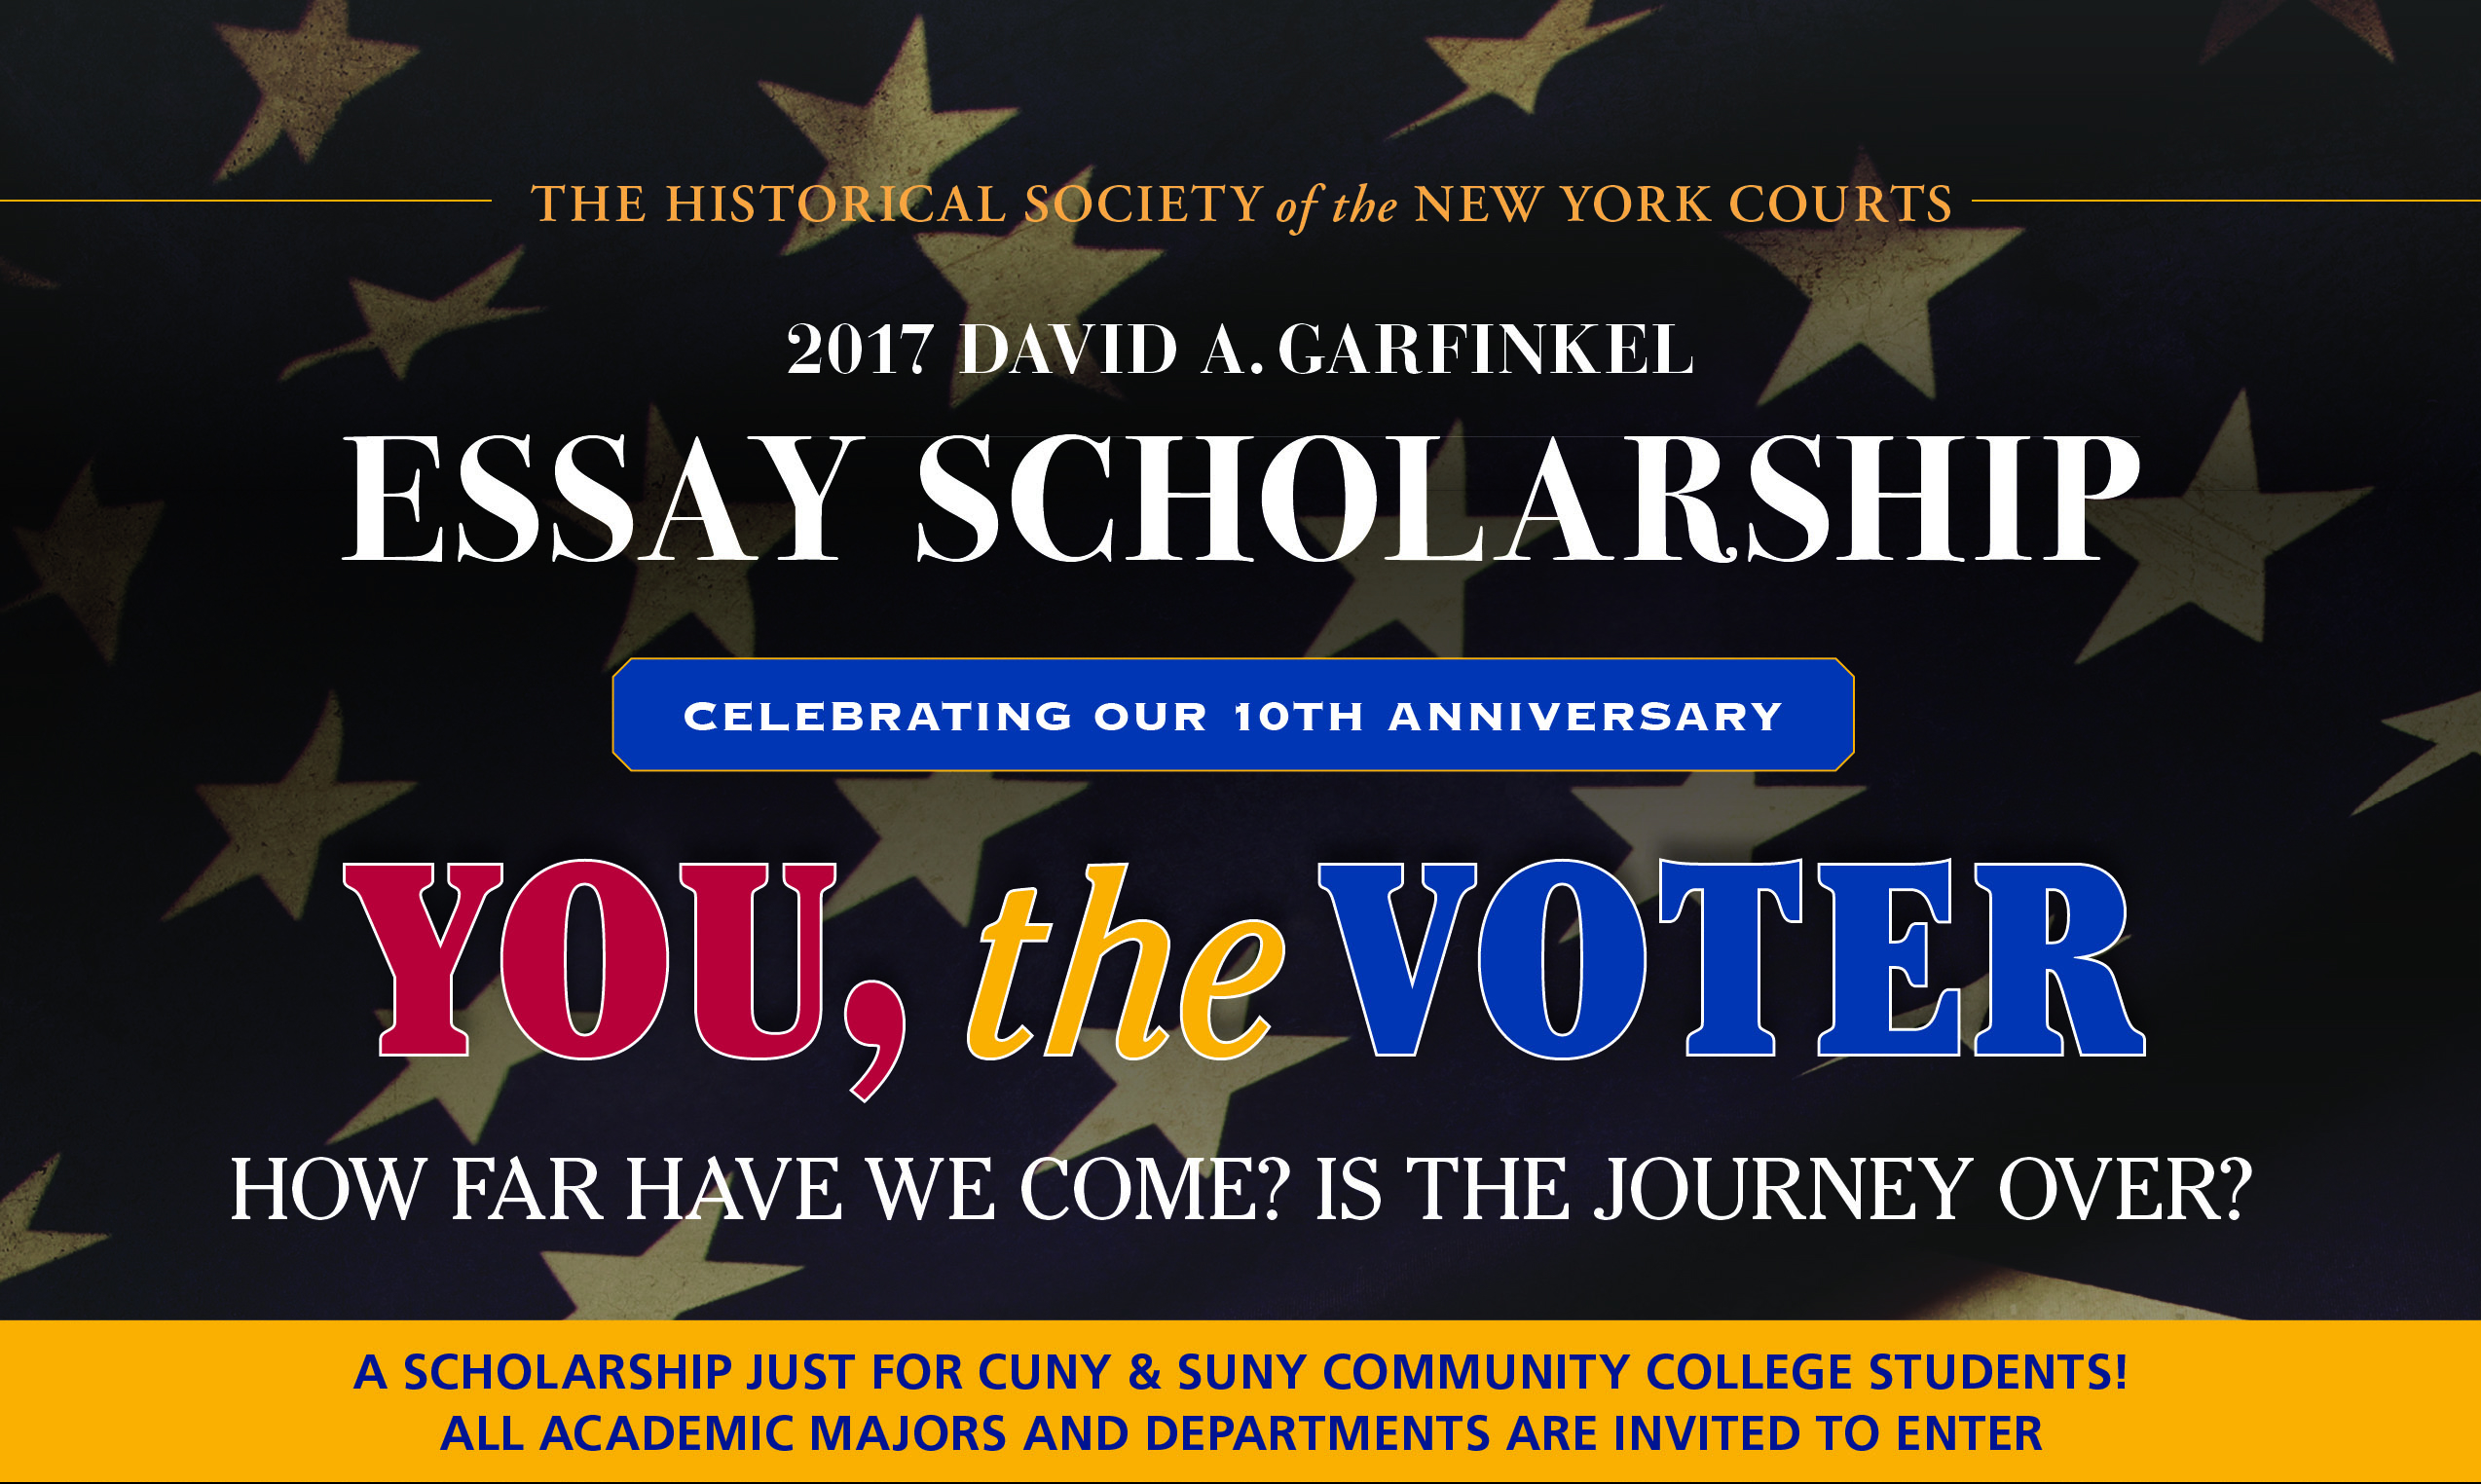 2017 Garfinkel Essay Scholarship